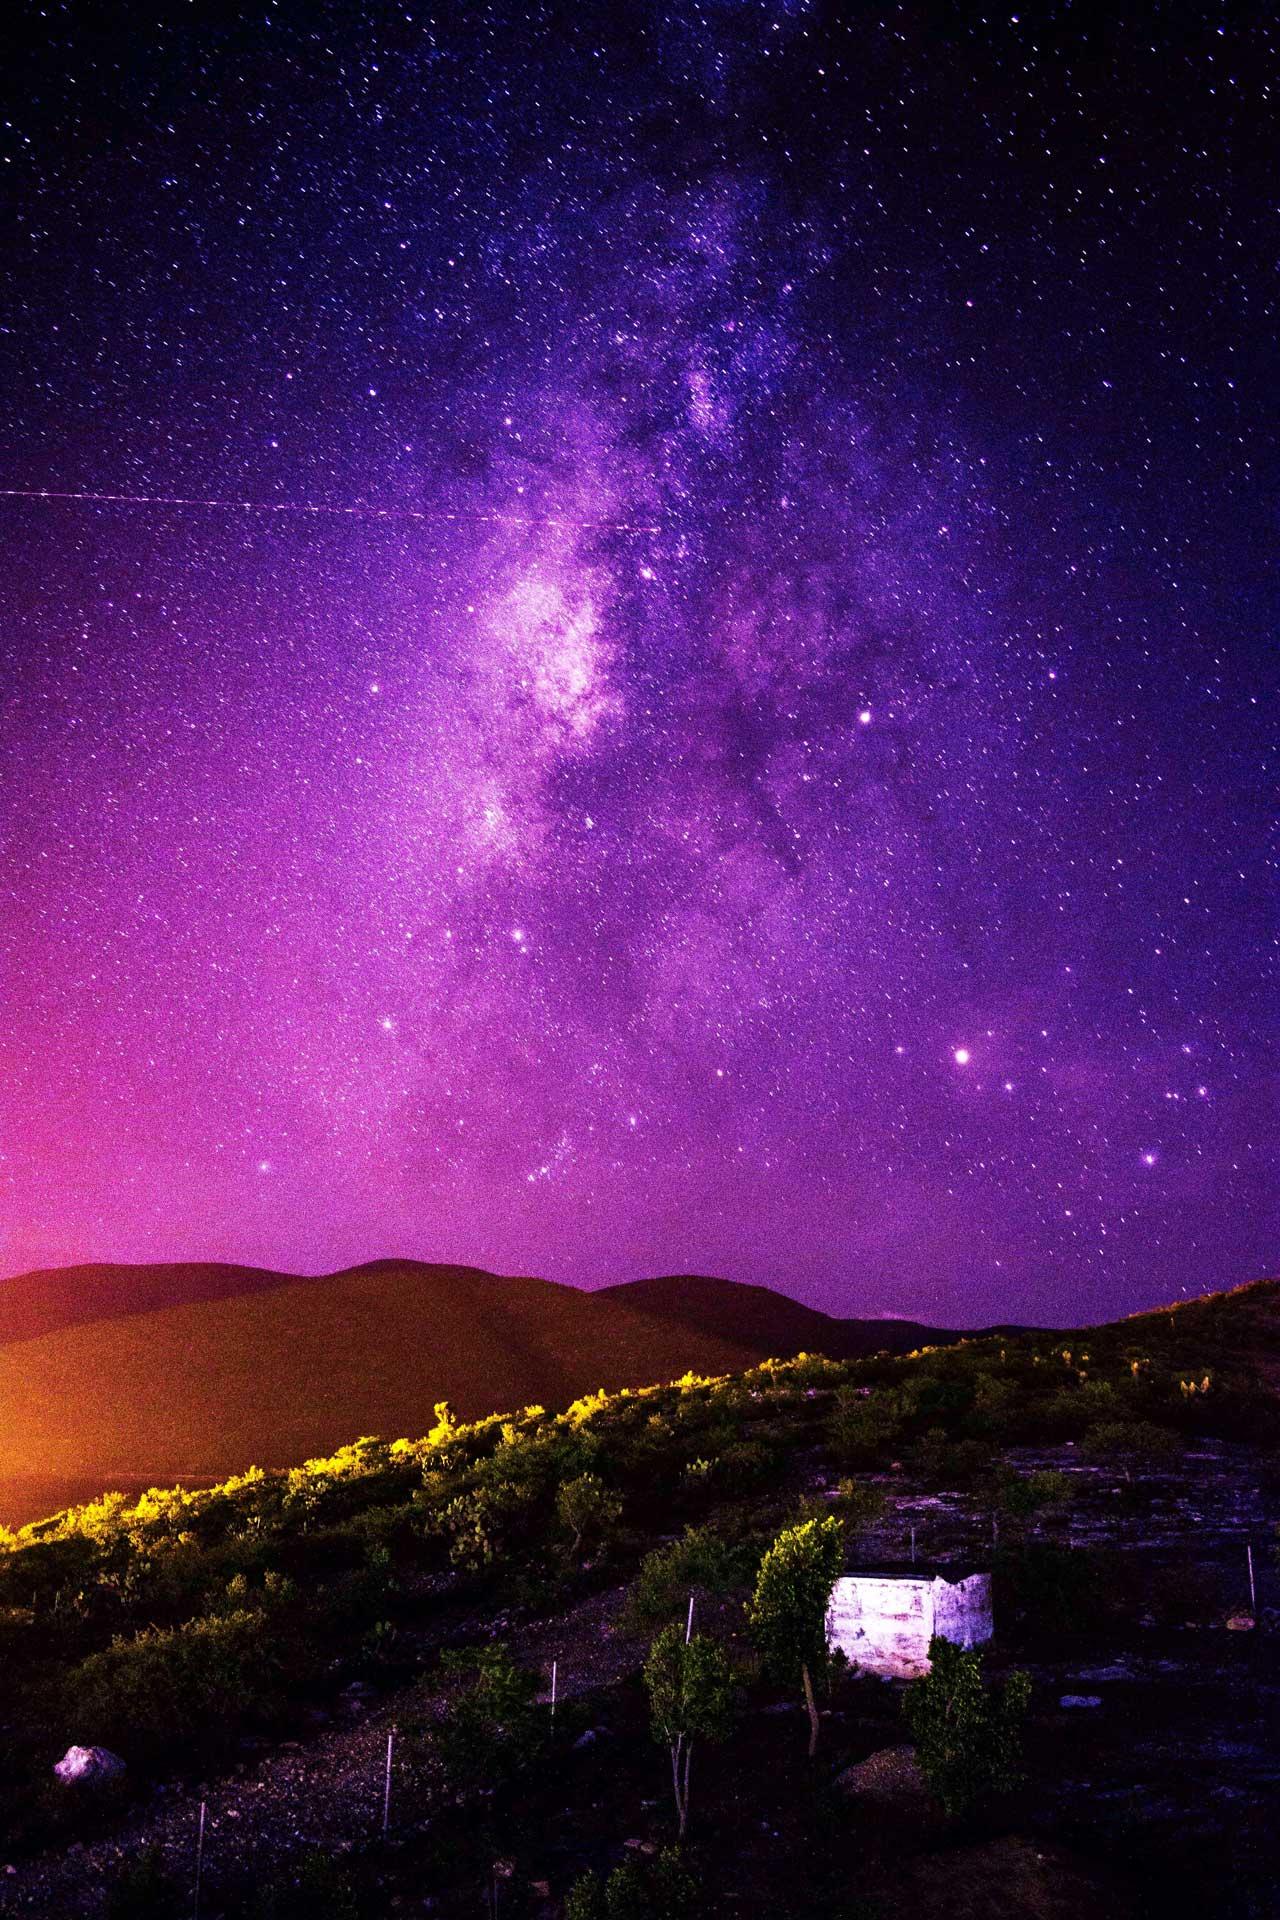 foto di Luck Galindo da <a href='https://www.pexels.com/it-it/foto/astronomia-cielo-cosmo-costellazione-544268/' target='_blank'>Pexels</a>